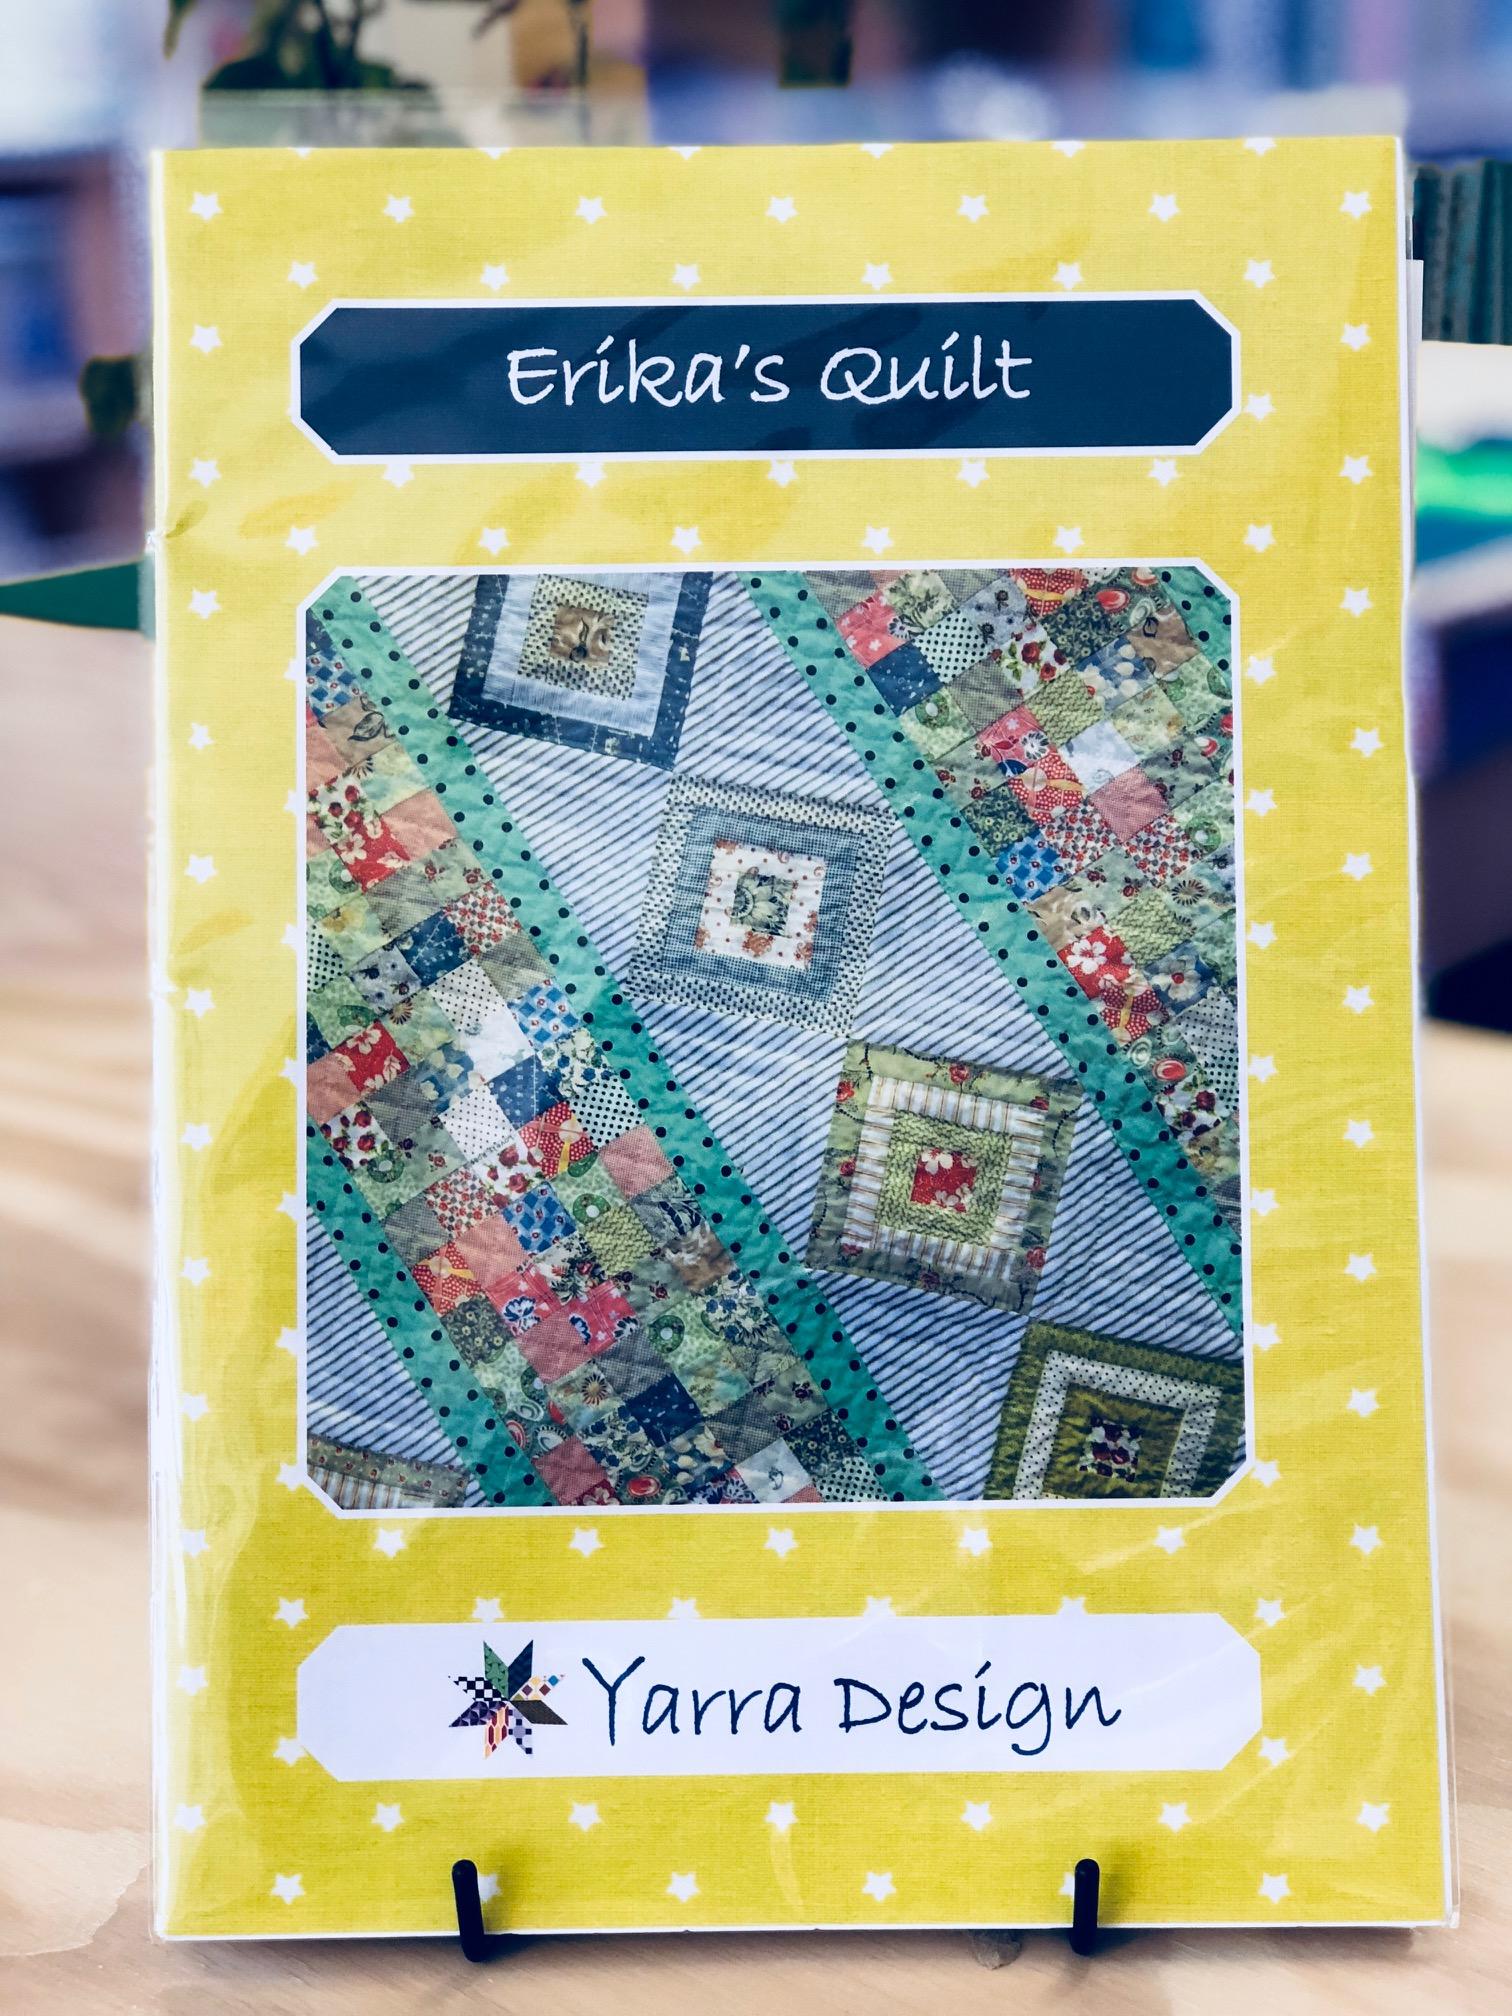 Yarra Design - Erika's Quilt